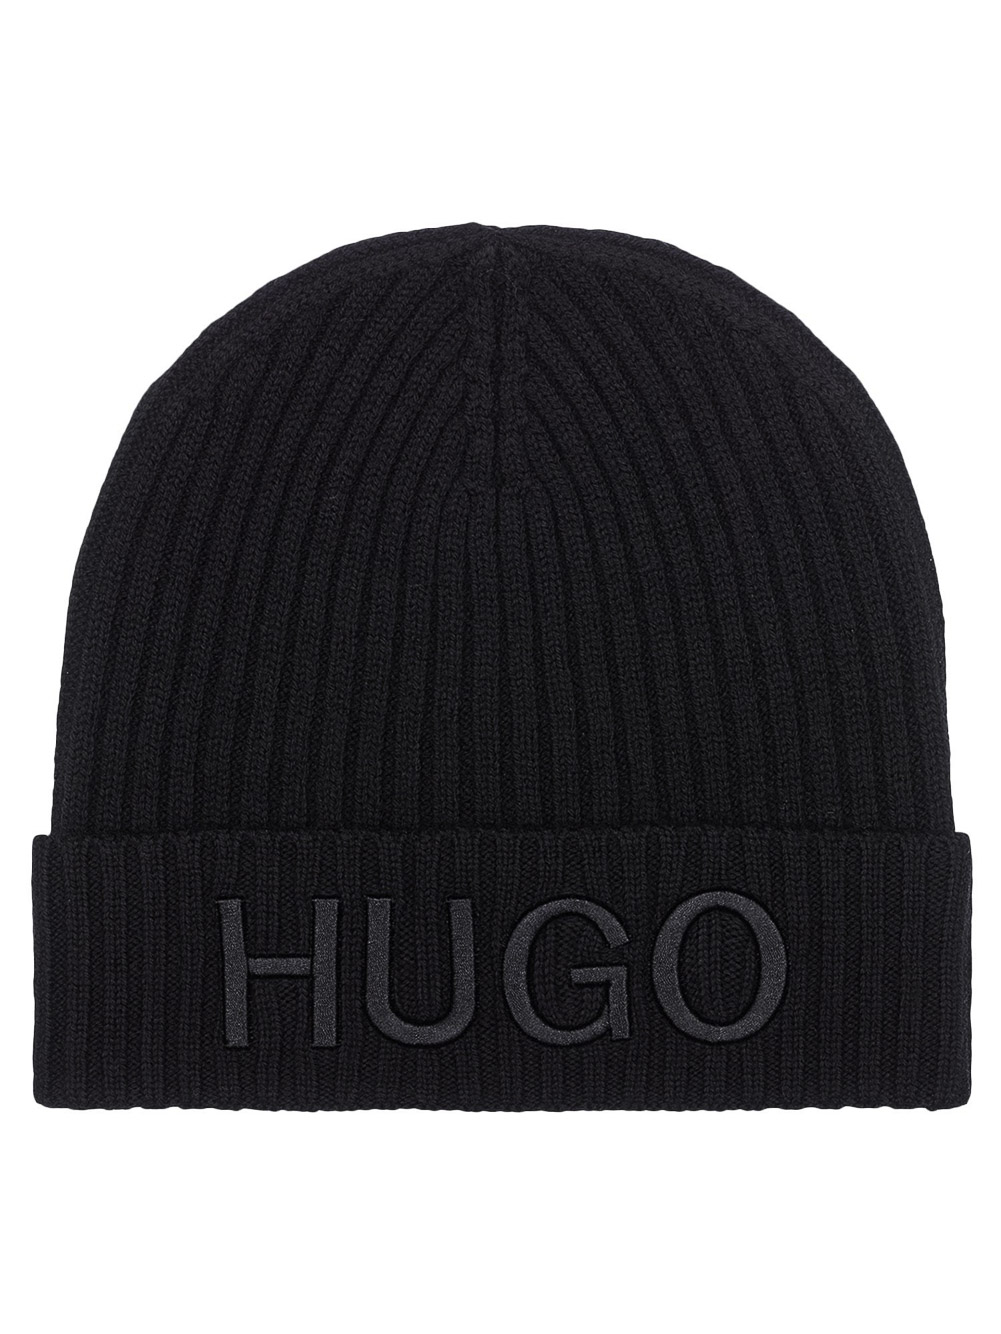 HUGO Σκούφος ανδρικός 50438407-001 ΜΑΥΡΟ